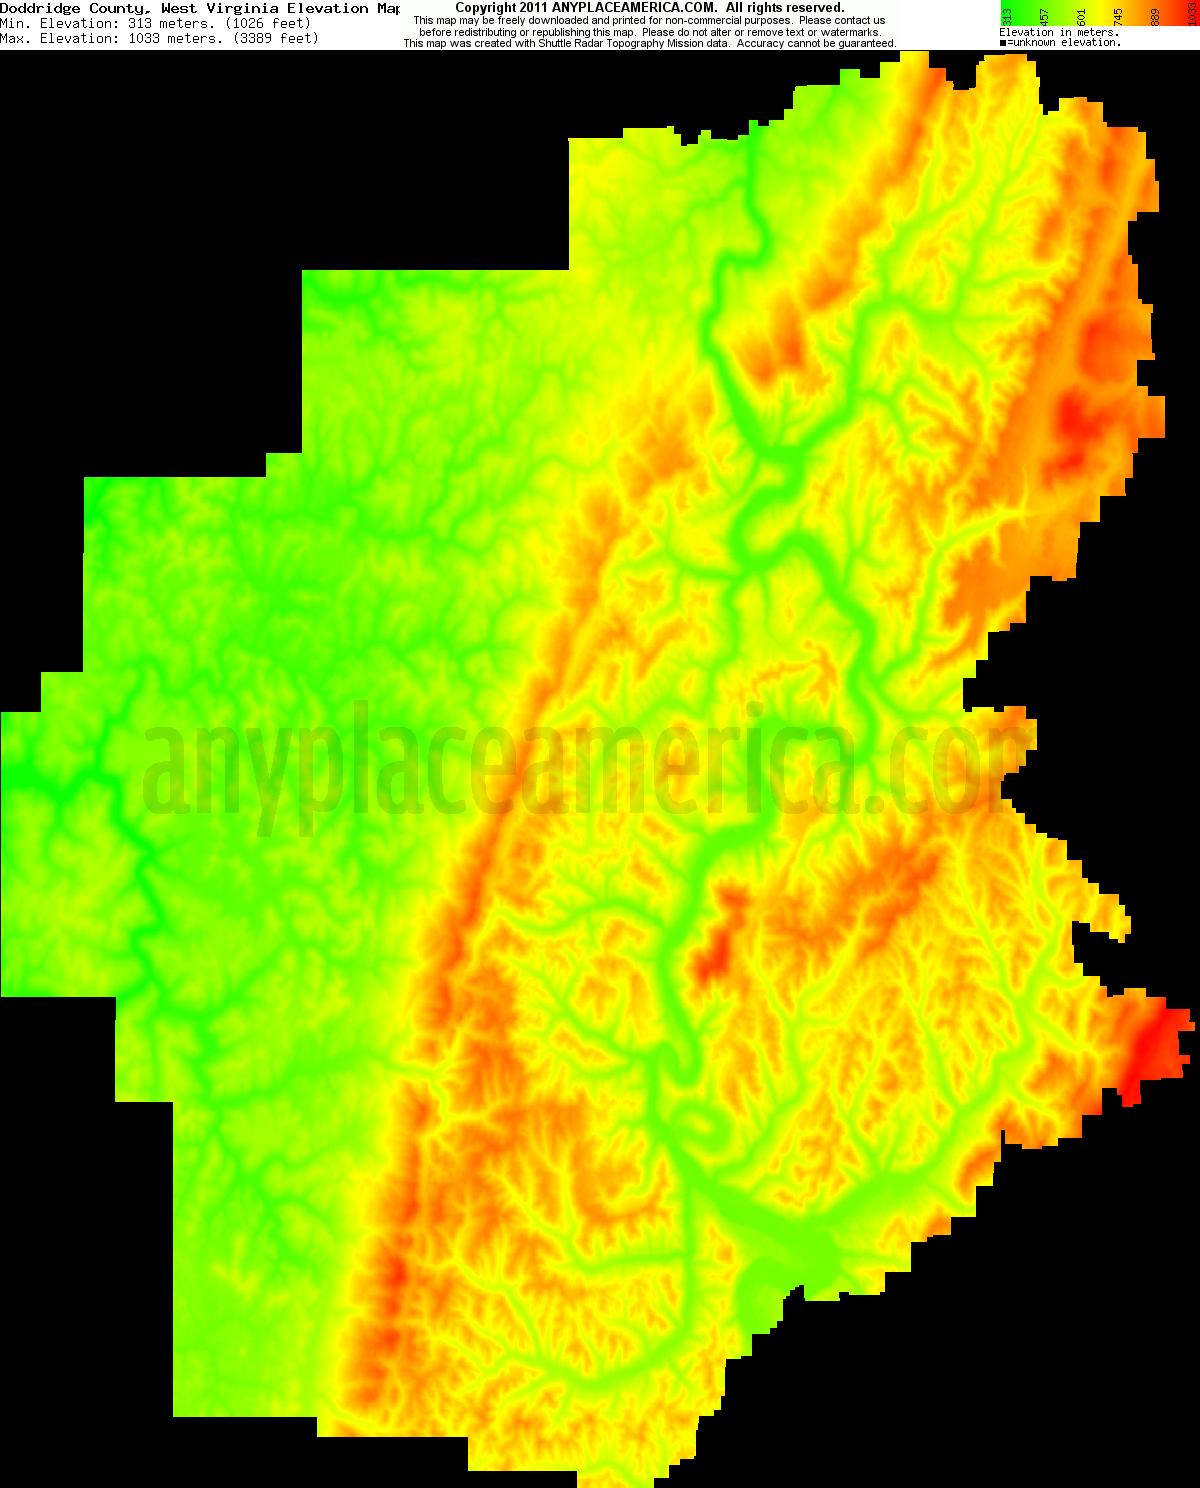 Free Doddridge County West Virginia Topo Maps Amp Elevations